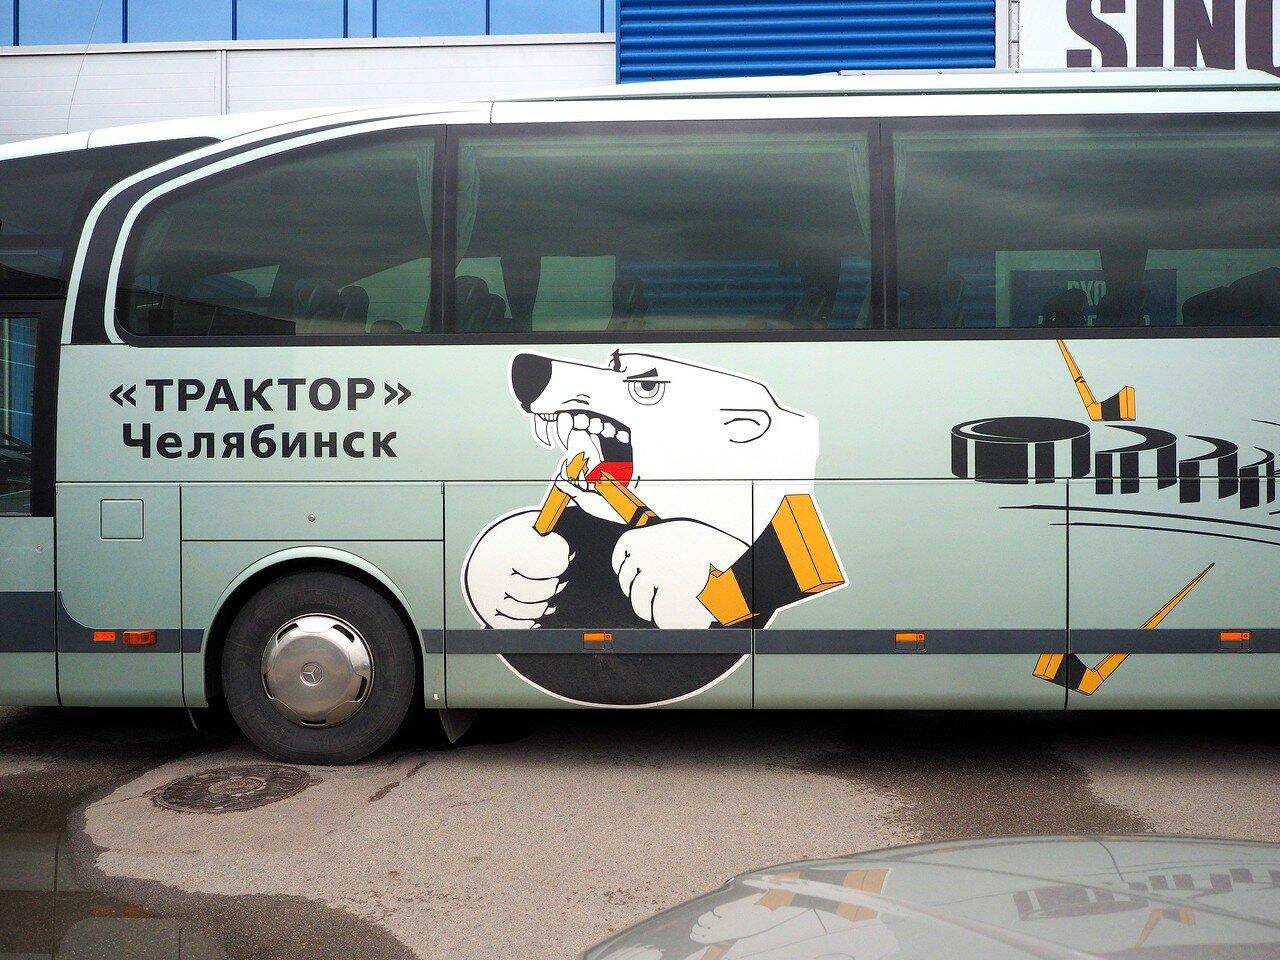 34 Мемориал Ромазана 2017. Трактор - Сибирь 12.08.2017